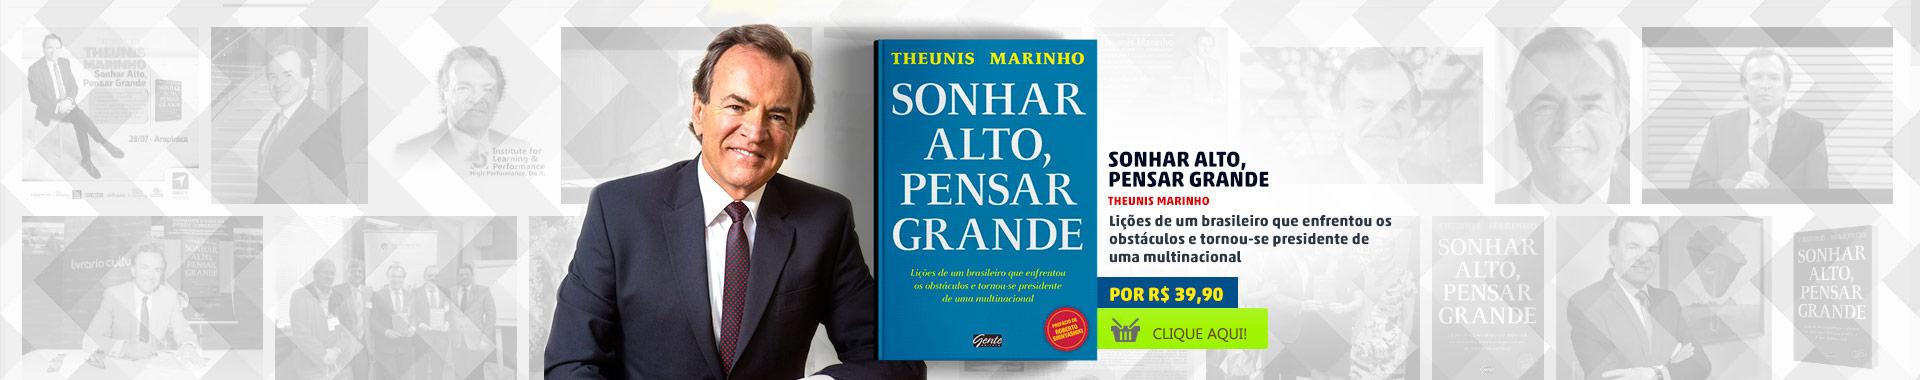 Theunis Marinho